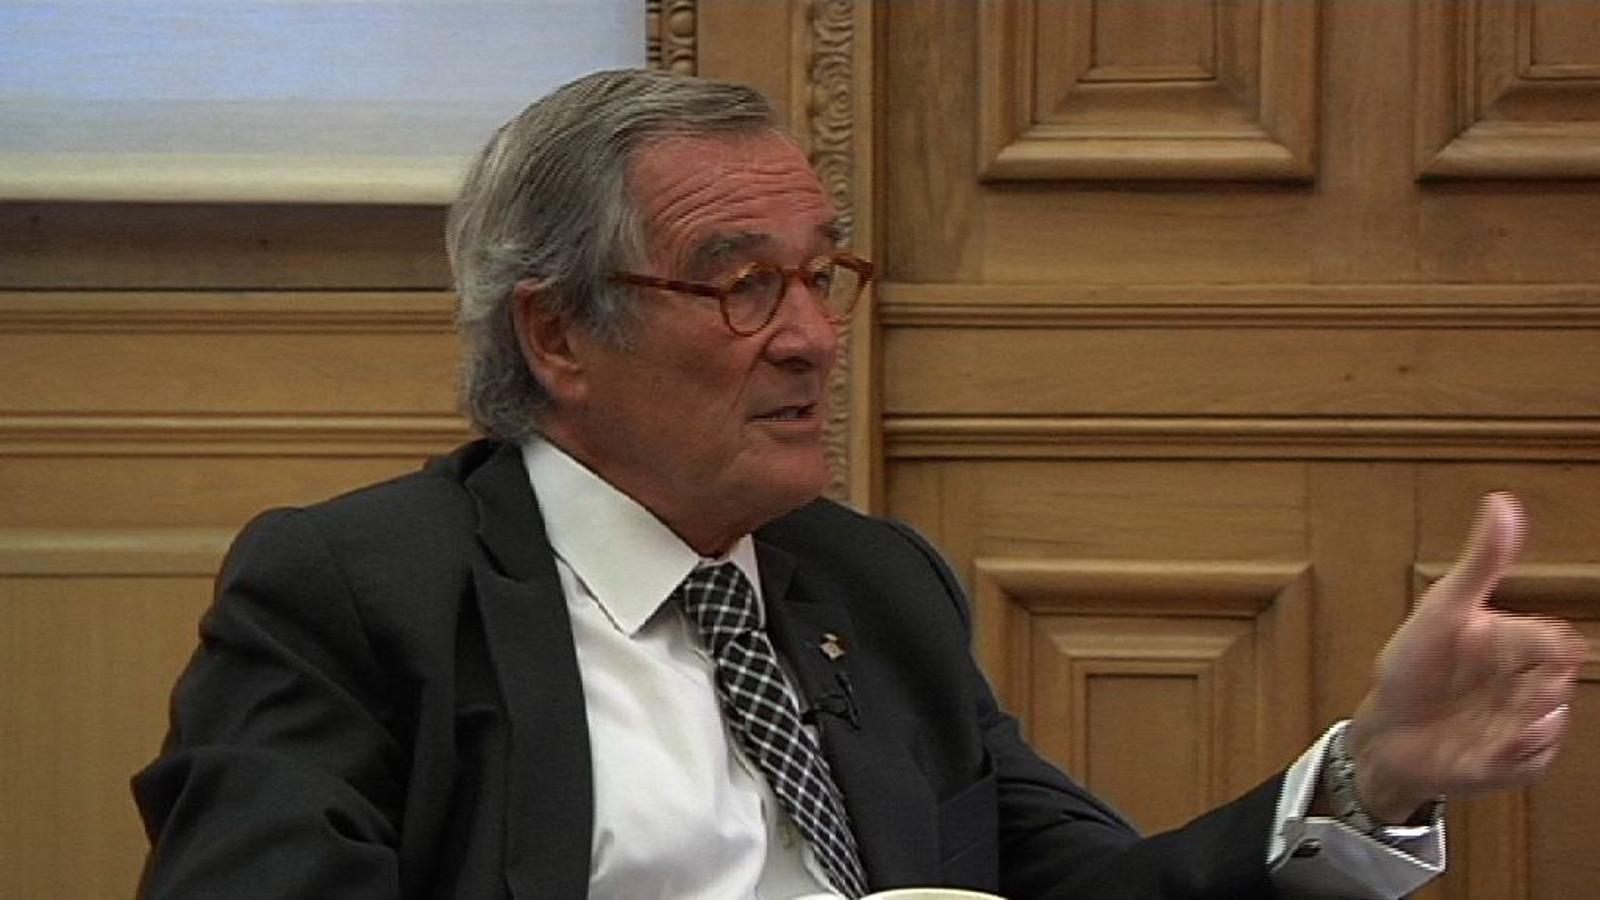 Xavier Trias: Sense Eurovegas, m'evito moltes discussions i molts problemes